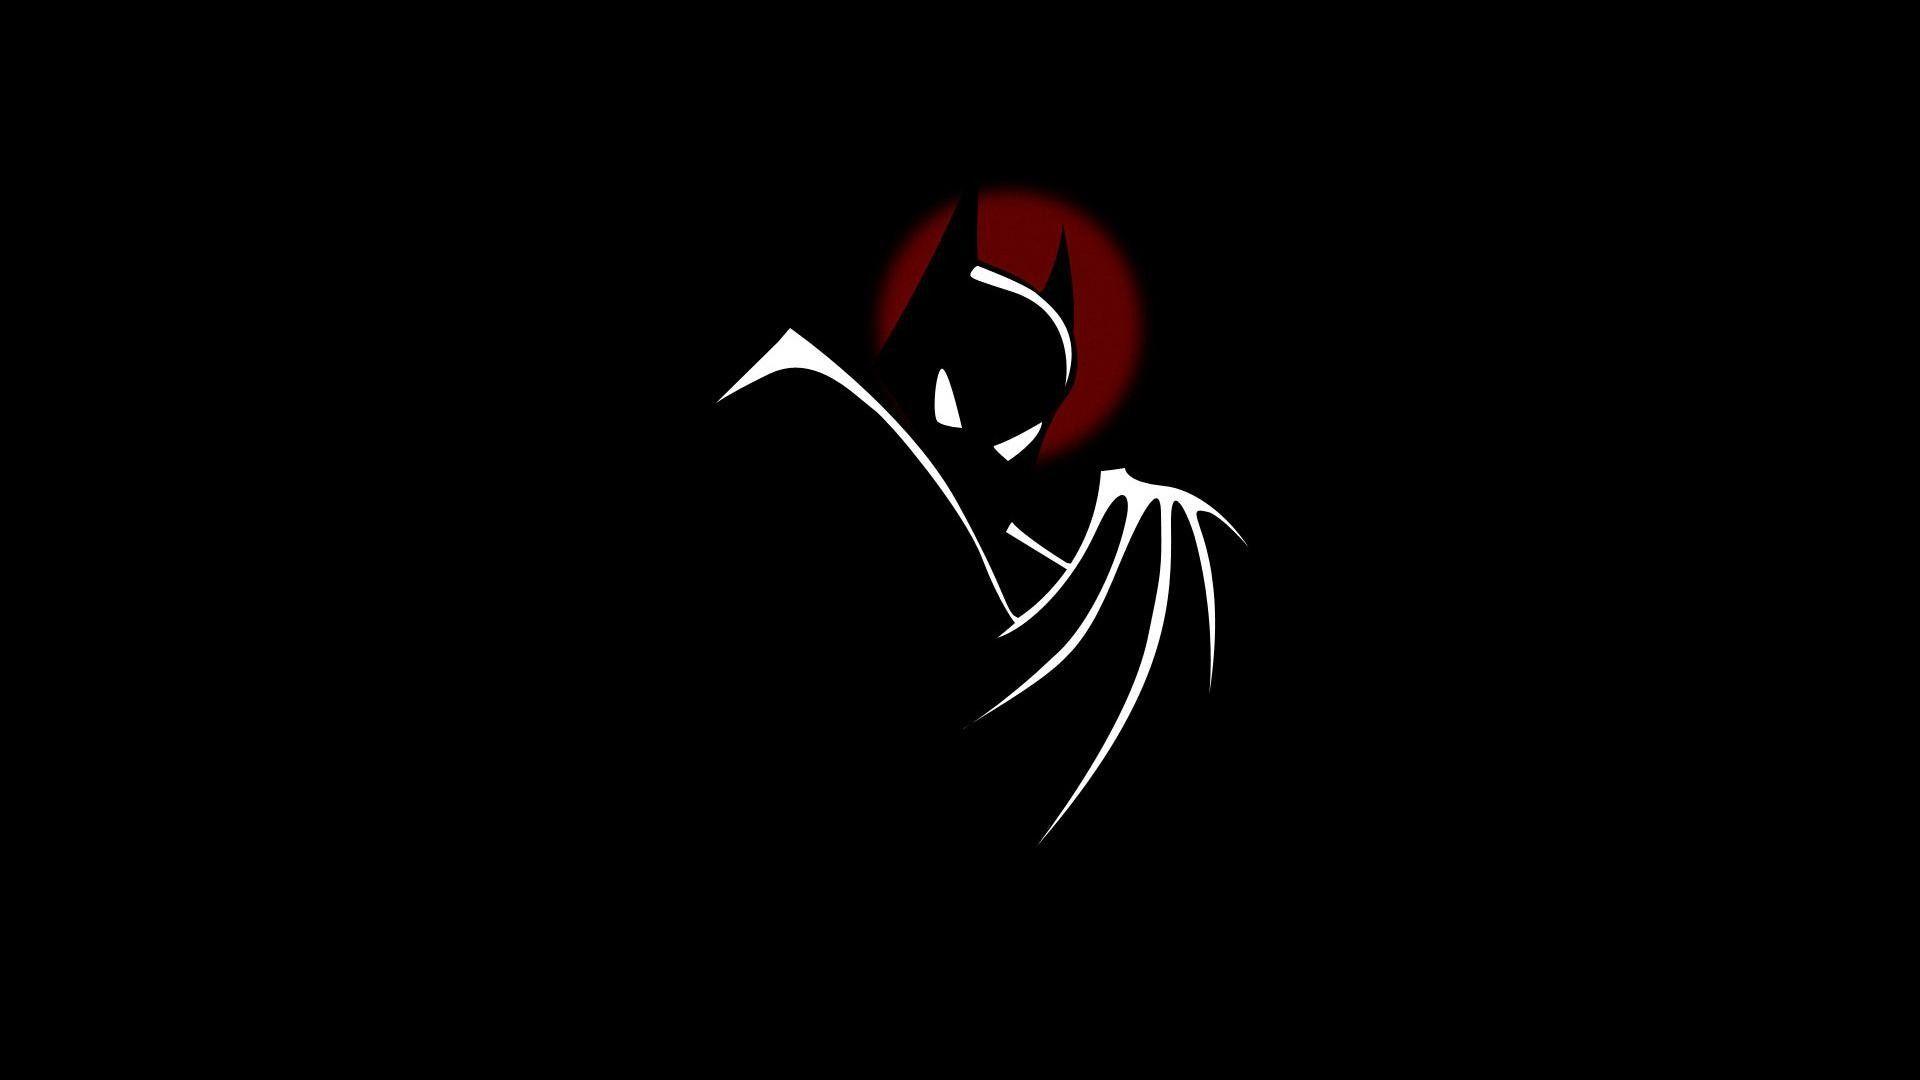 Batman Arkham Knight HD Desktop Wallpaper High Definition 1920x1080 Hd